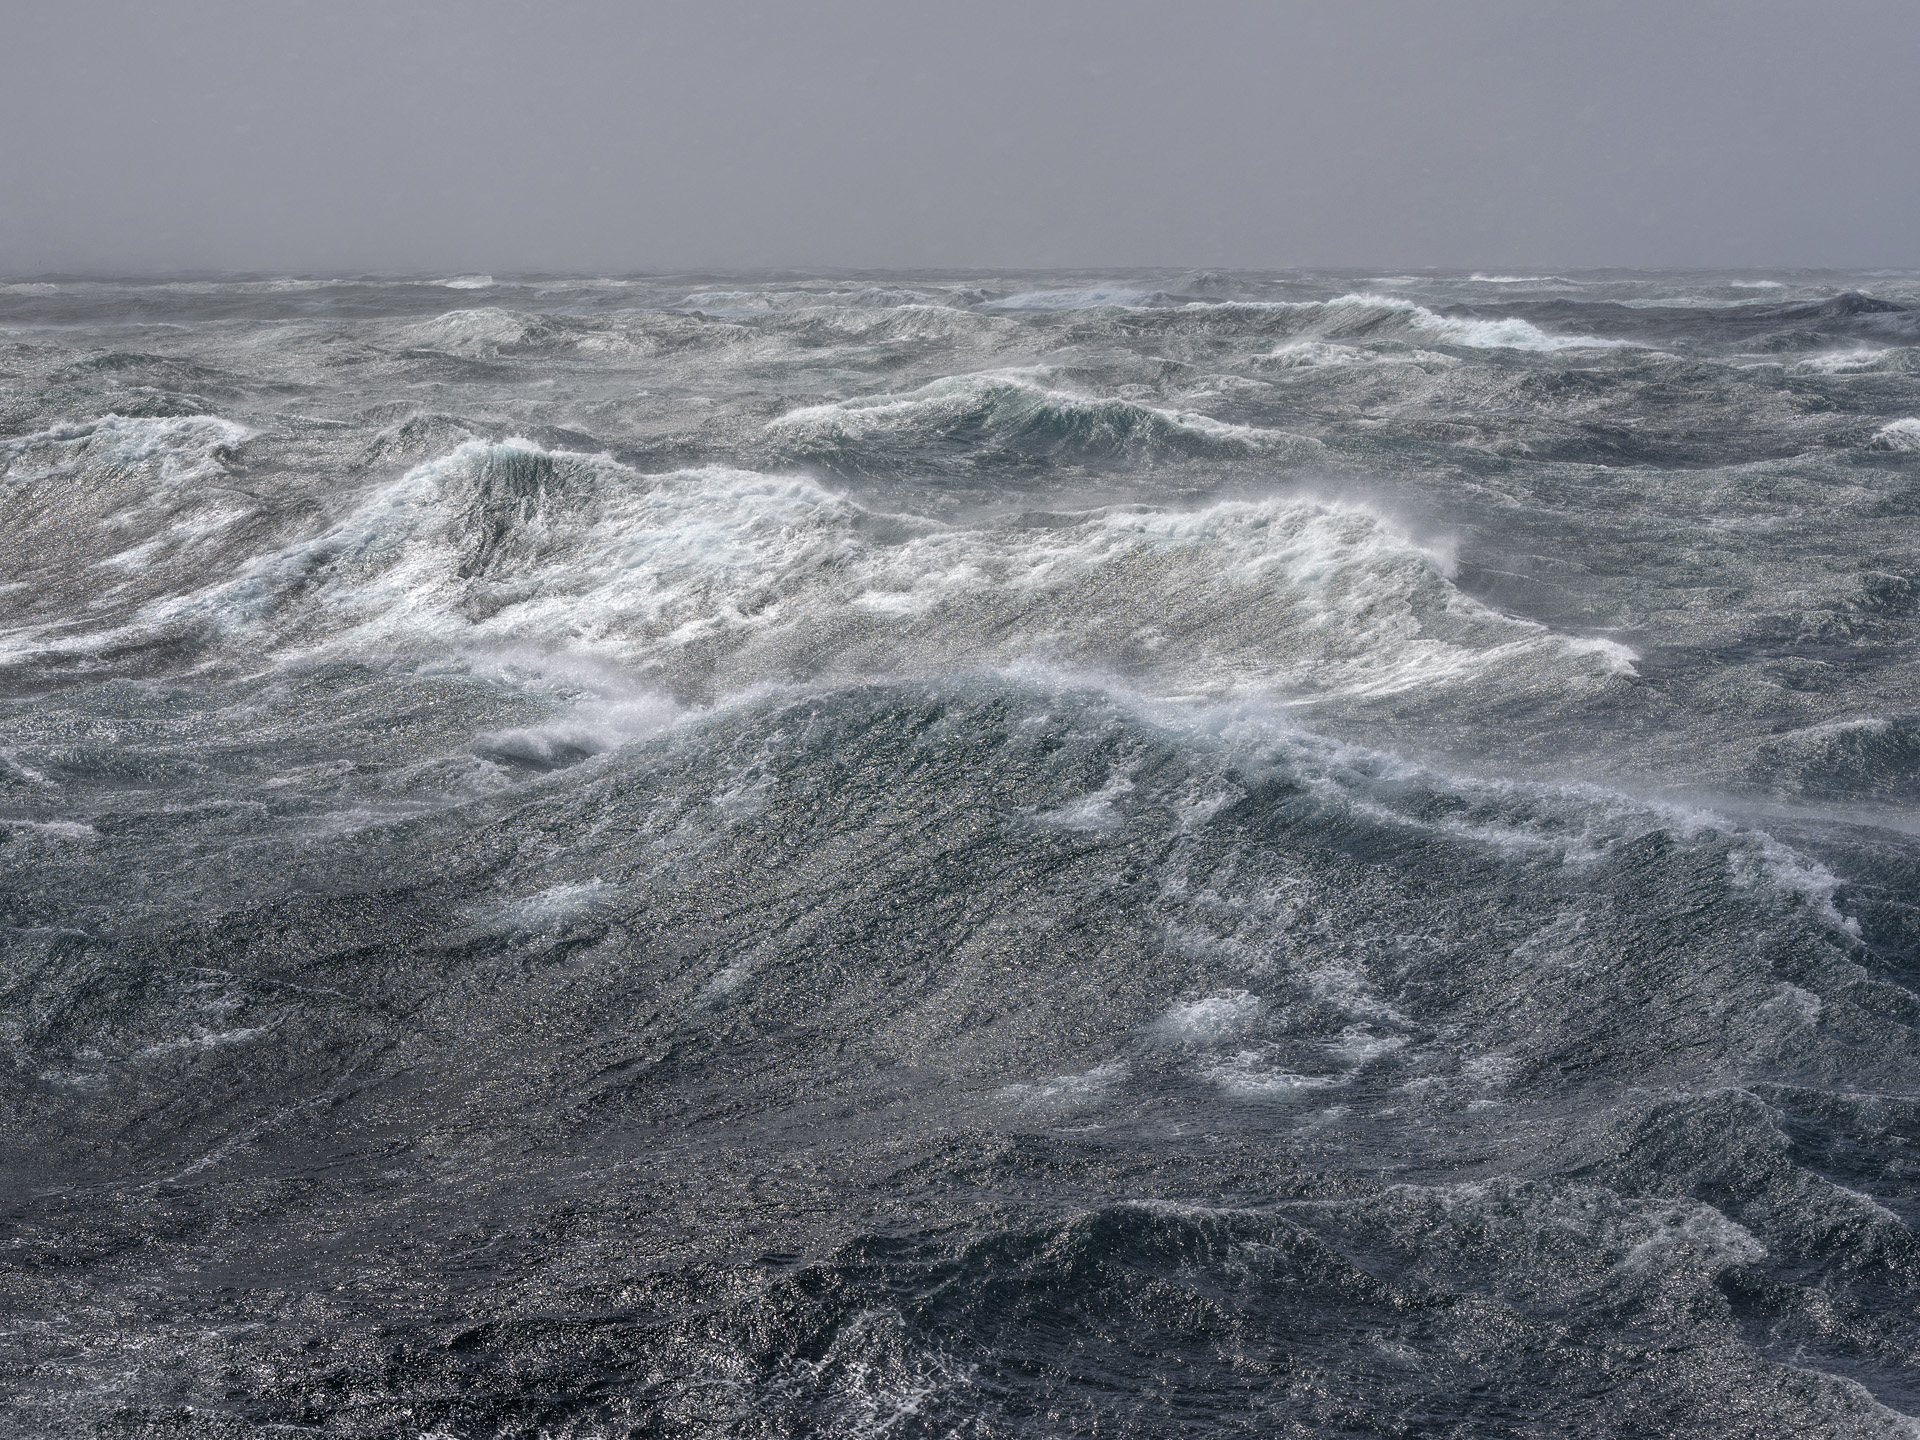 Stormy Sea, Drake Passage, Antarctica 2016